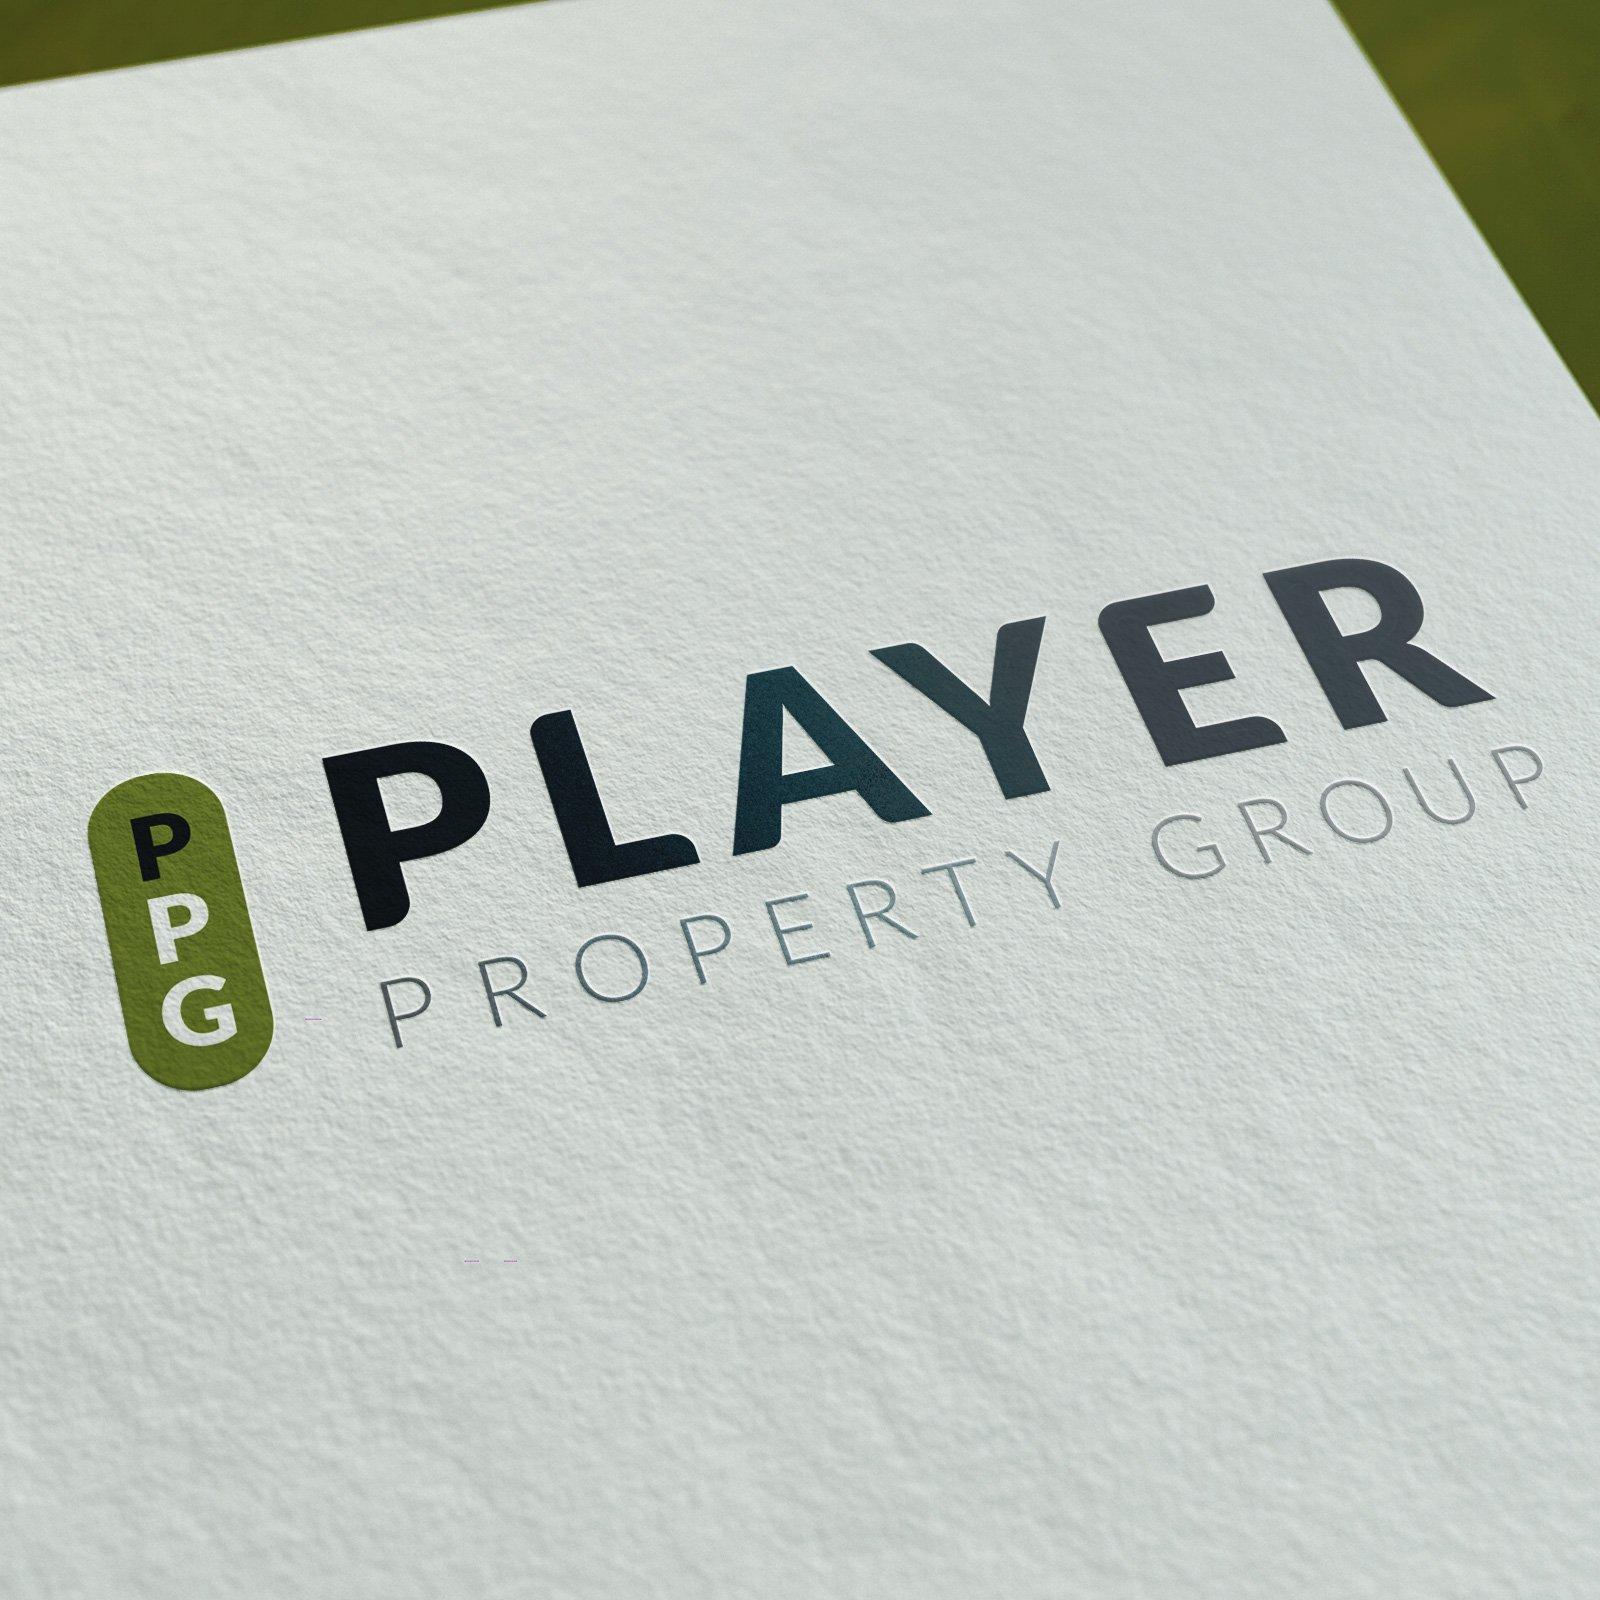 Player Property Group Logo Design